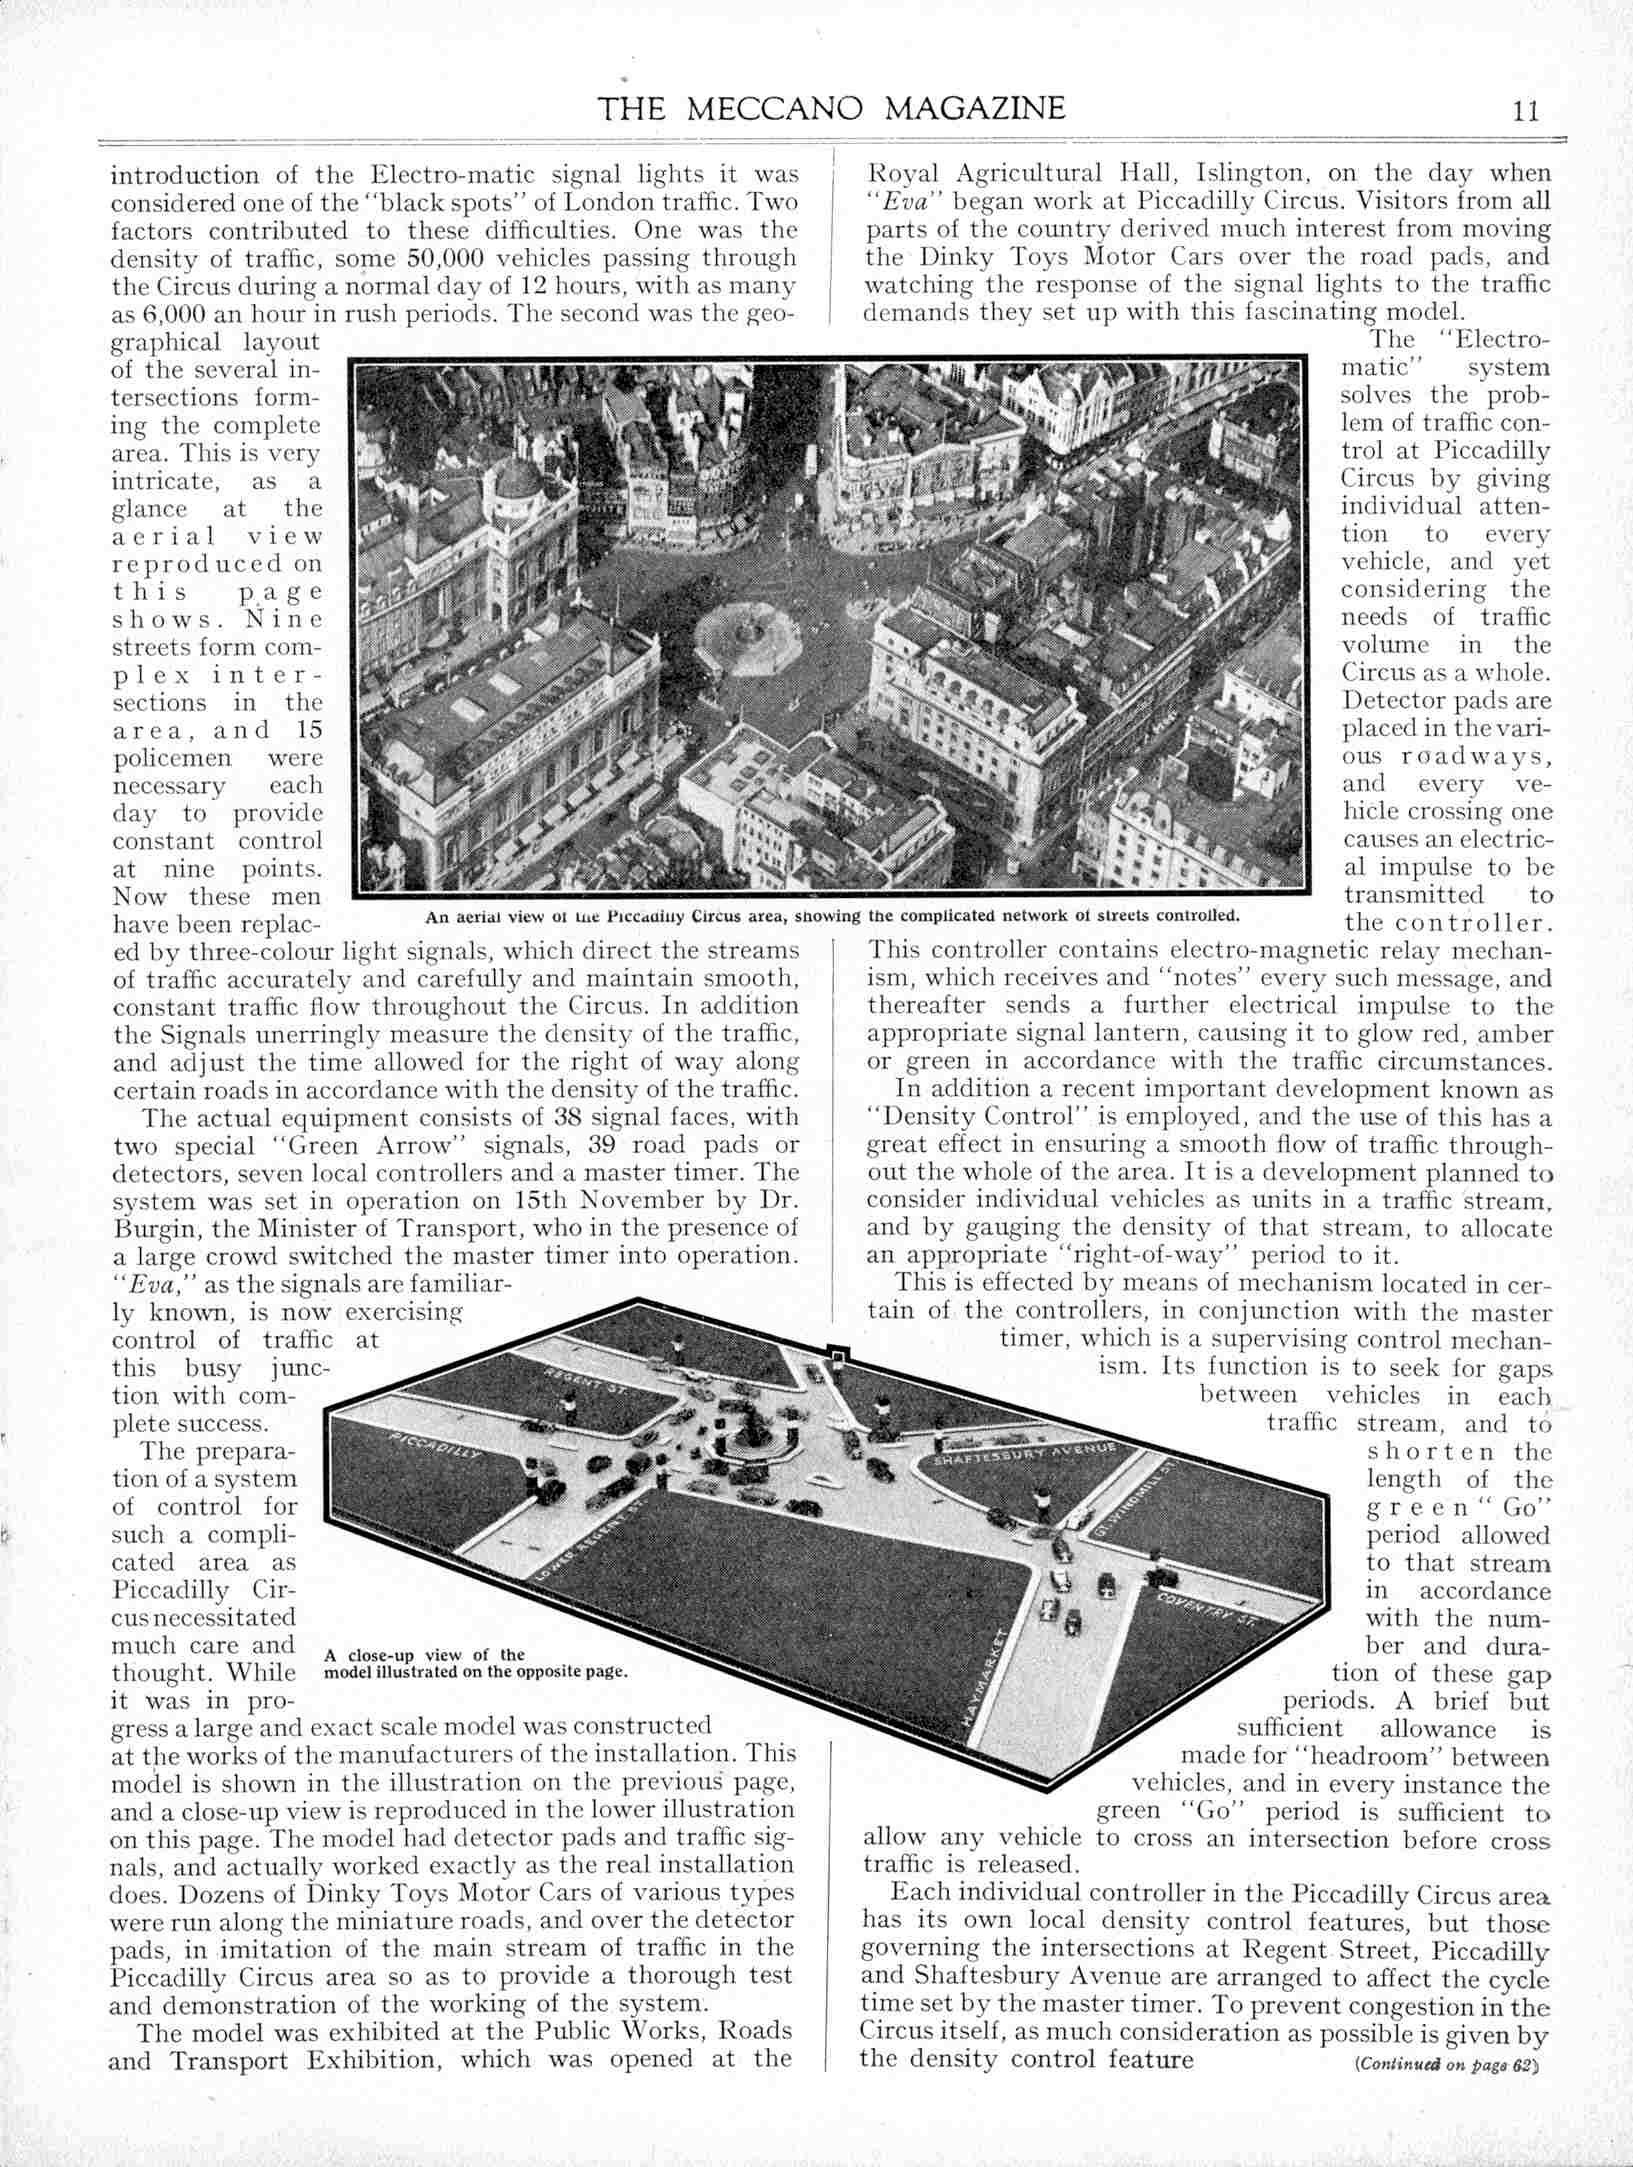 UK Meccano Magazine January 1938 Page 11